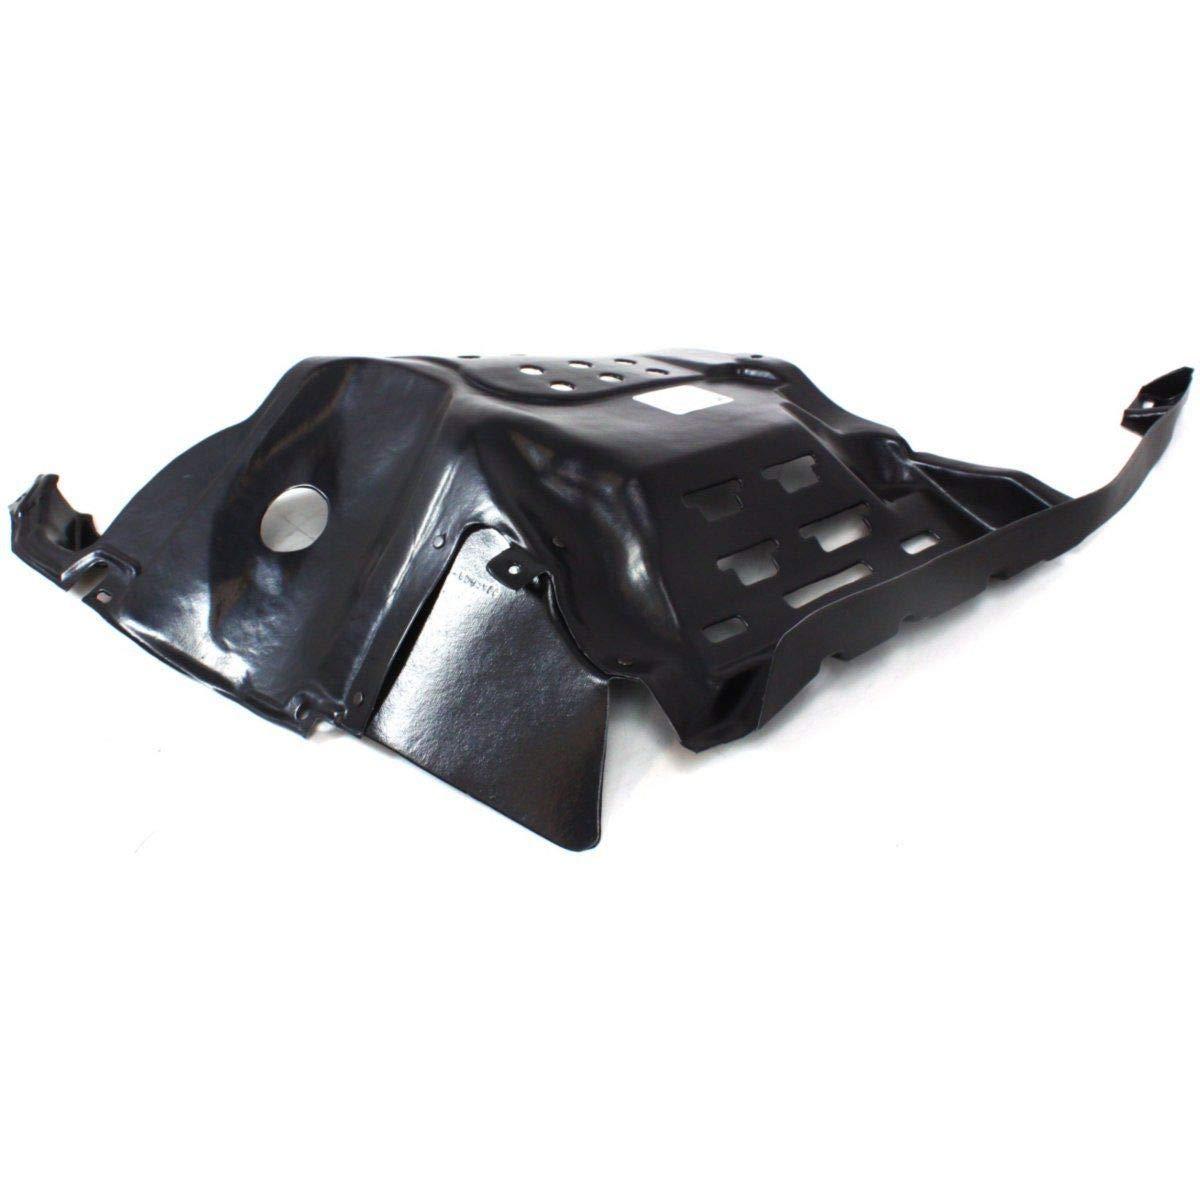 Left Engine Splash Shield For 2001-2007 Ford Escape 2005-2007 Mercury Mariner